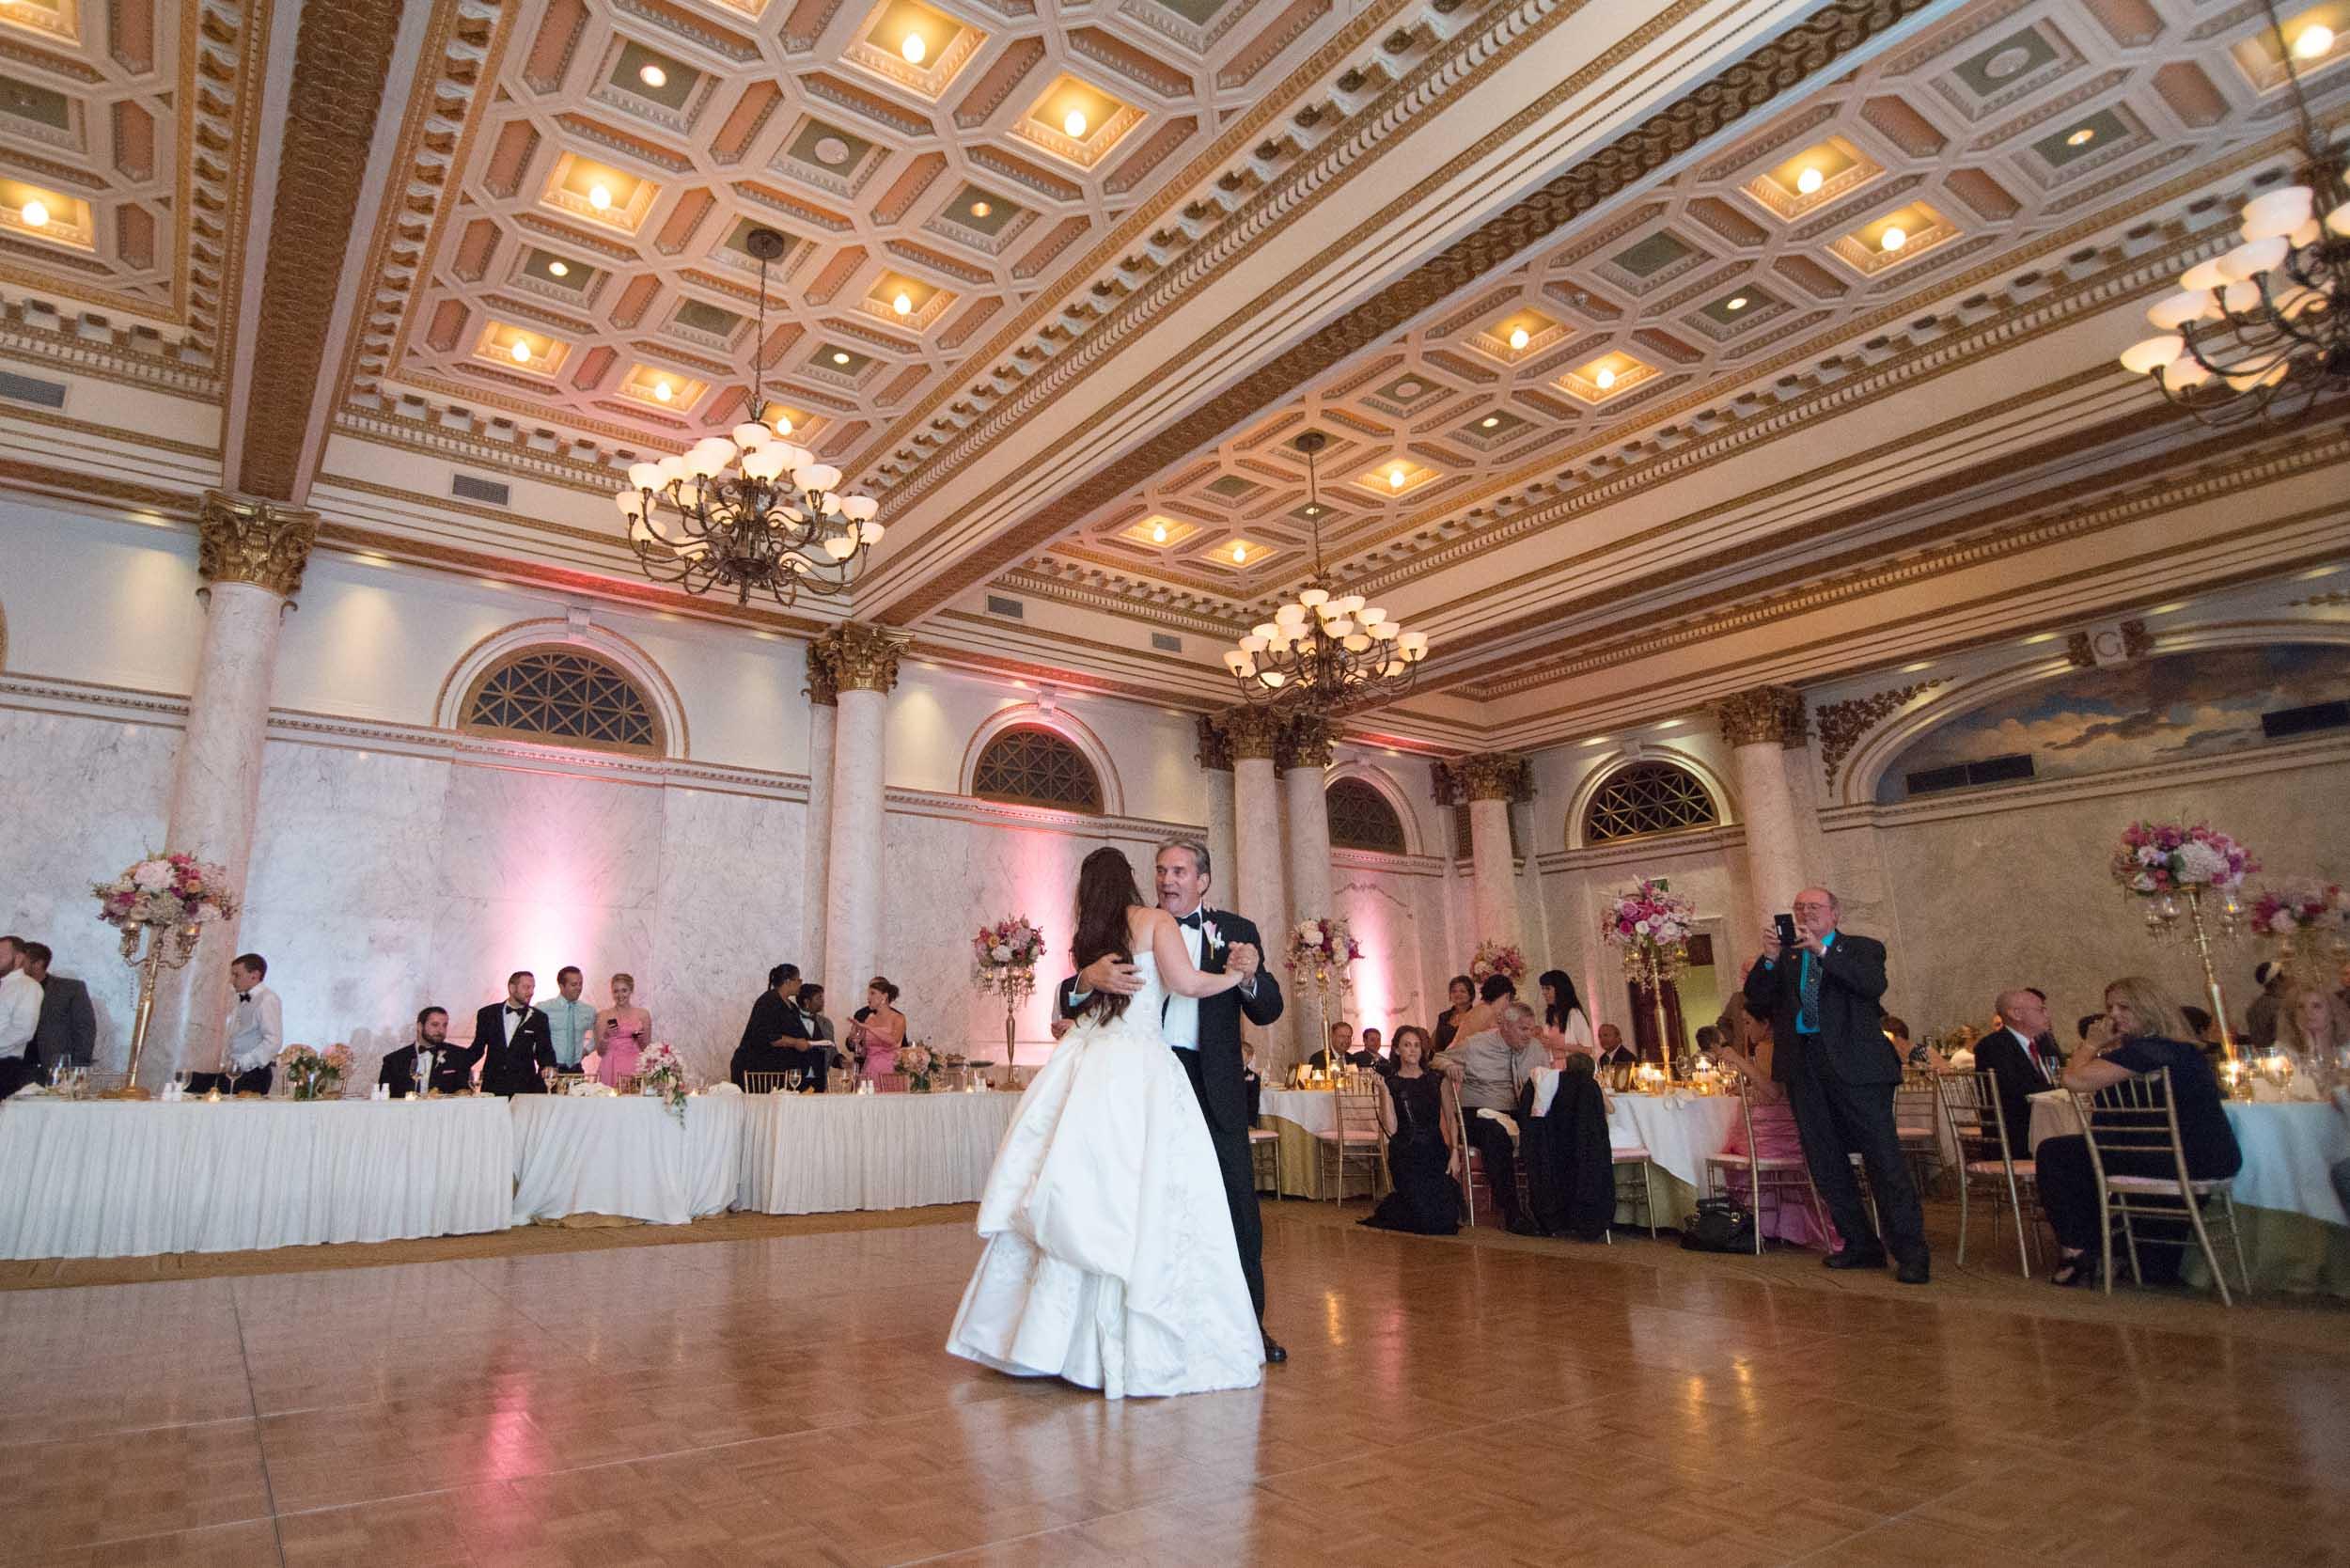 dc+metro+wedding+photographer+vadym+guliuk+photography+wedding+parent+dances-2022.jpg